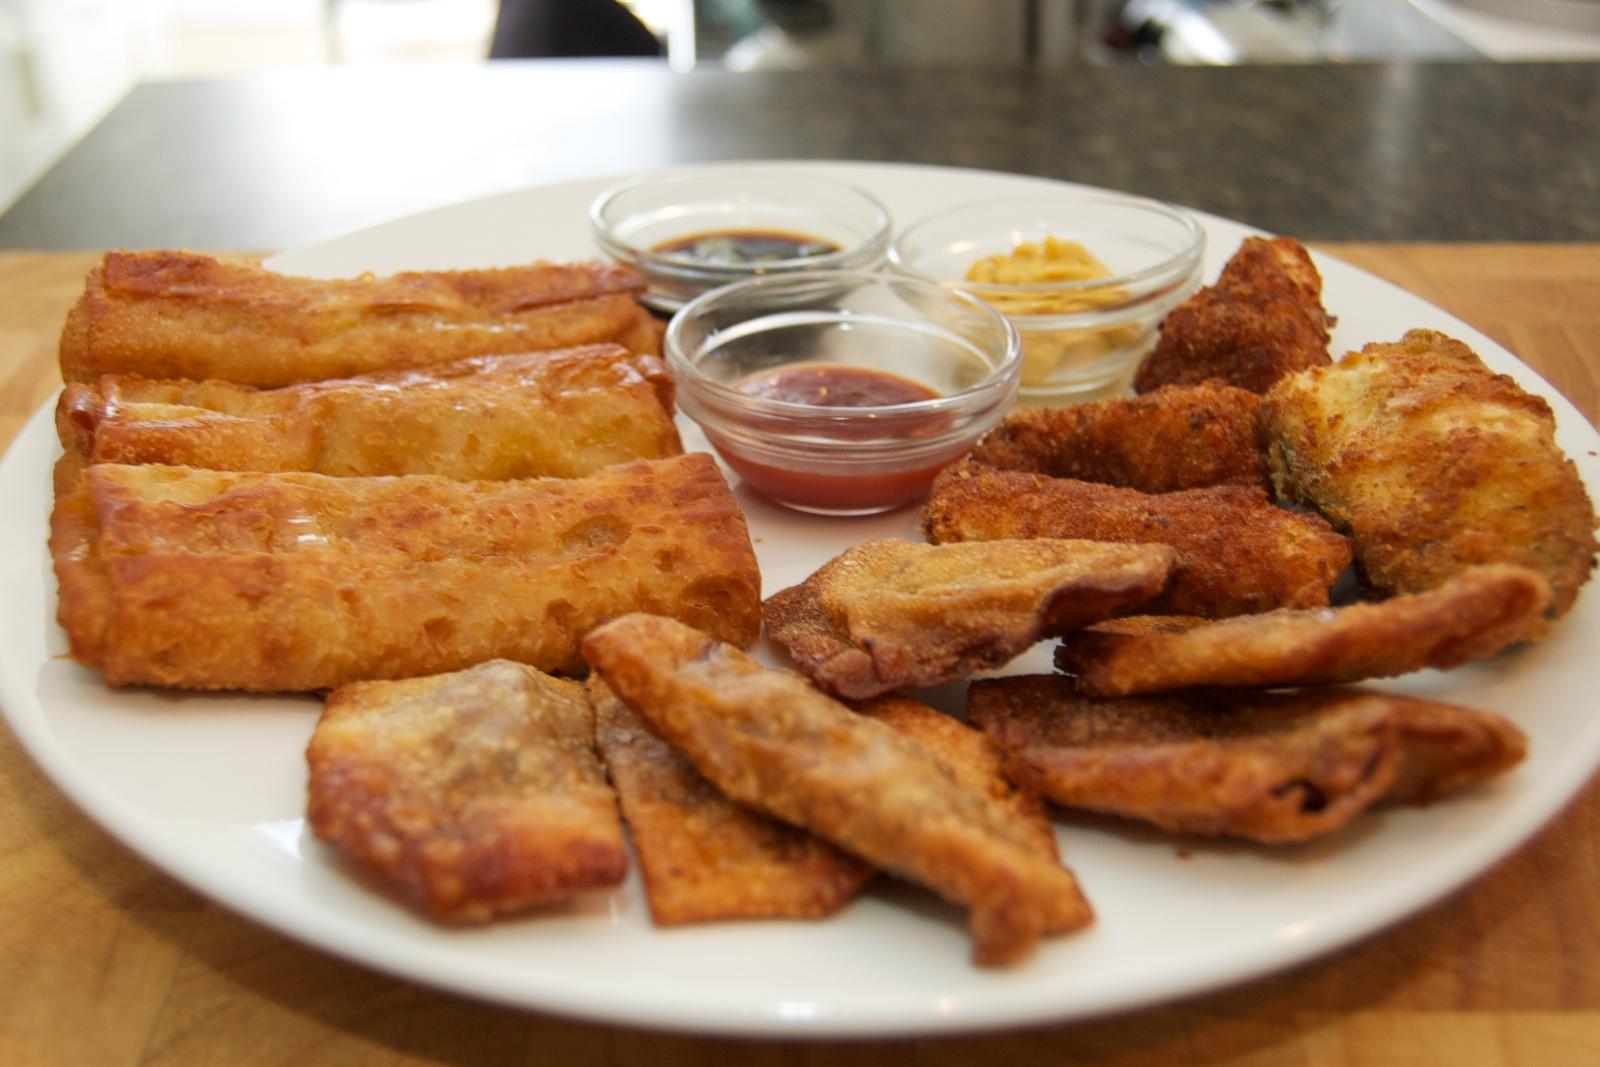 http://blog.rickk.com/food/2011/05/09/ate.2011.05.09.d.jpg